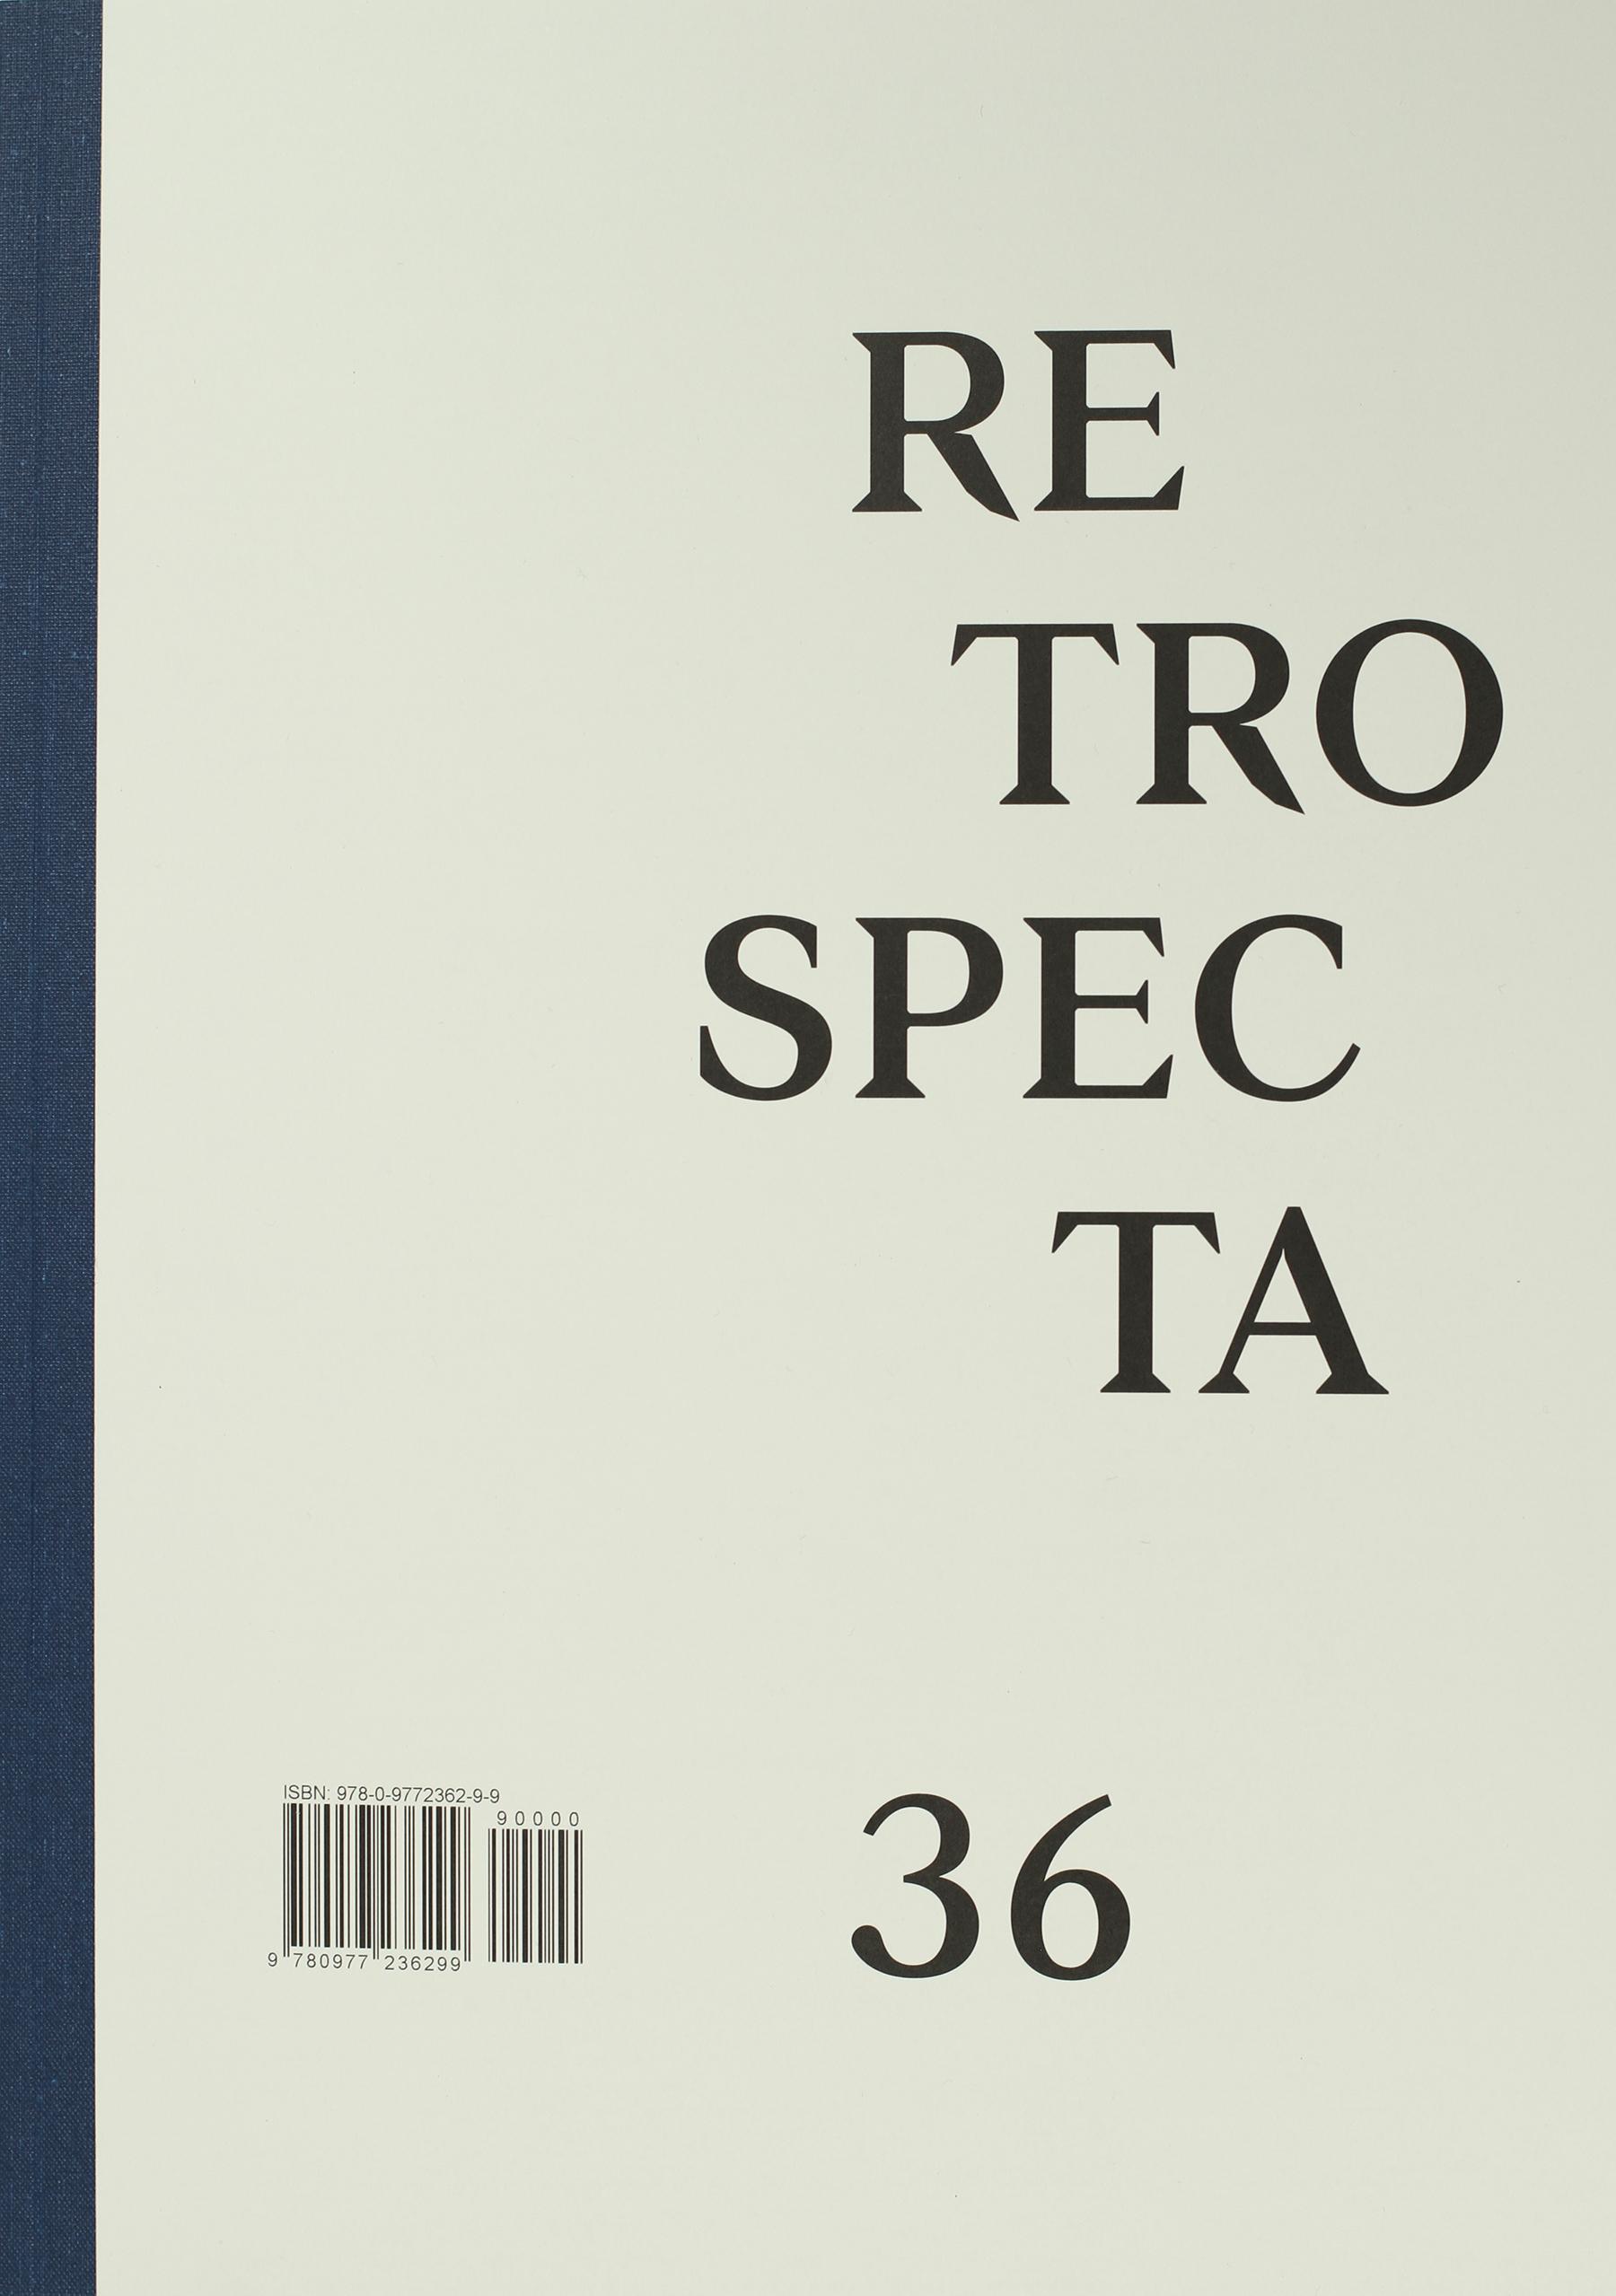 Retrospecta 36